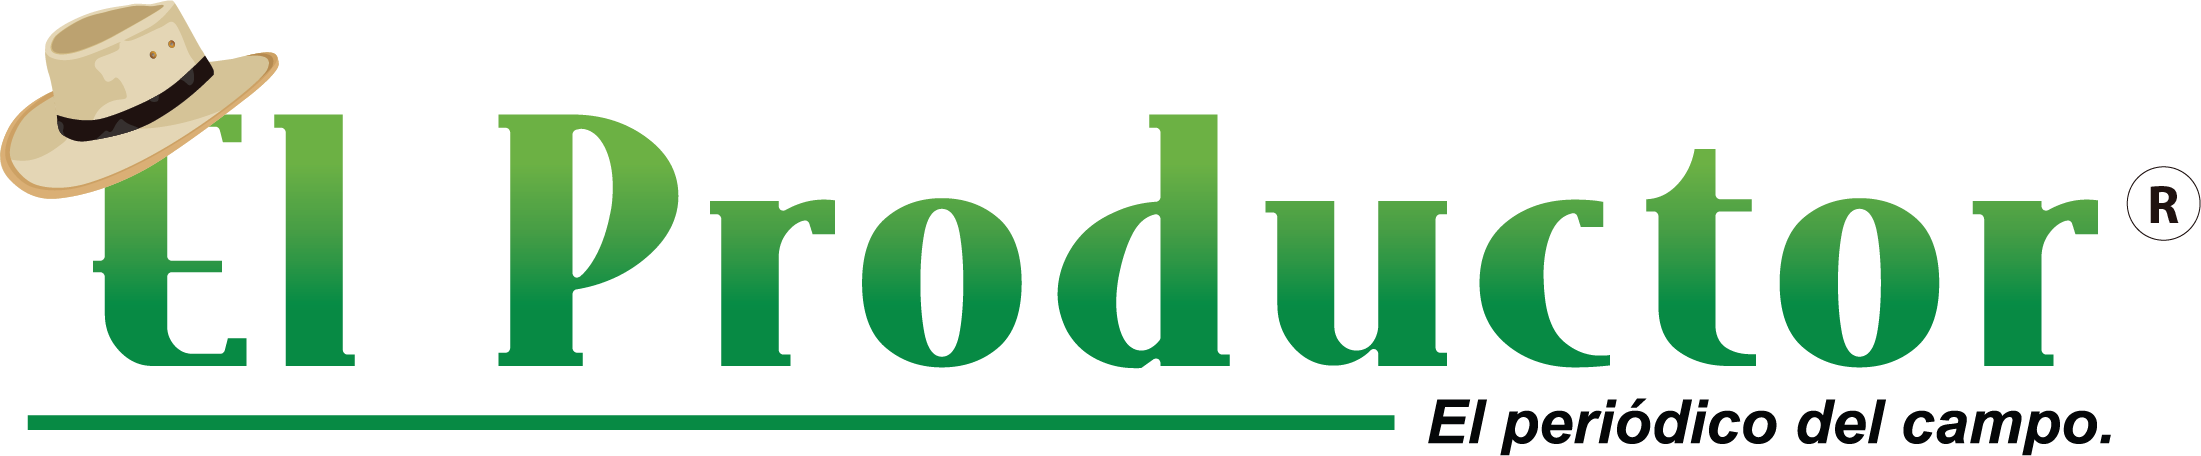 elproductor logo